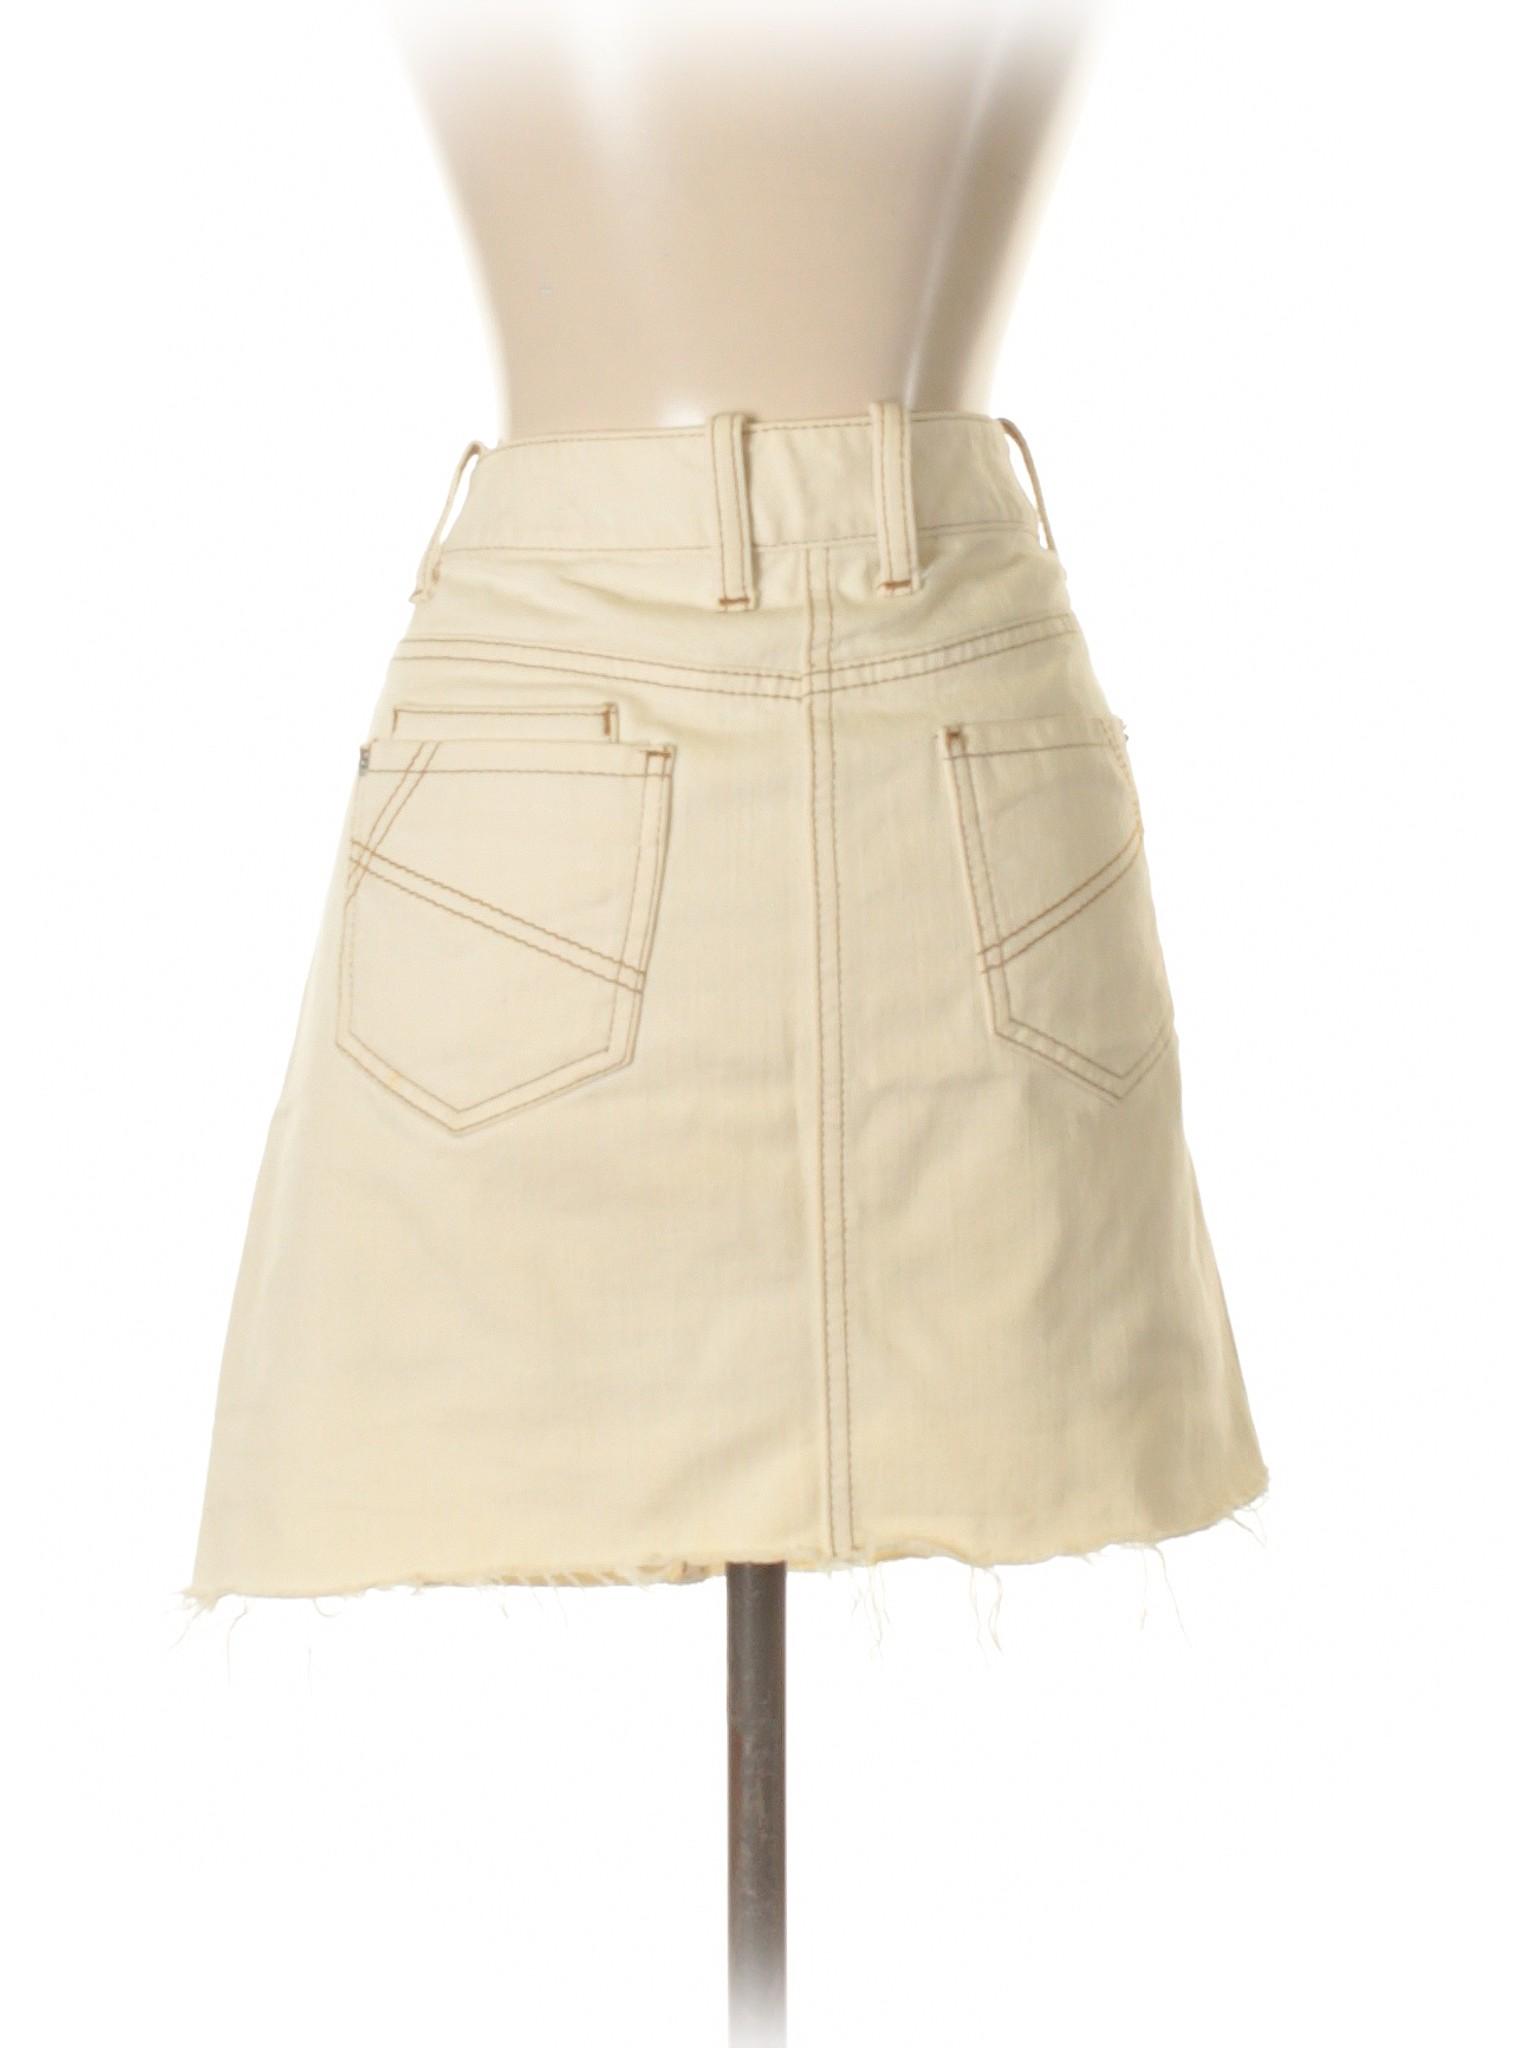 Denim Boutique Skirt Taylor Ann LOFT AAwFgcqp